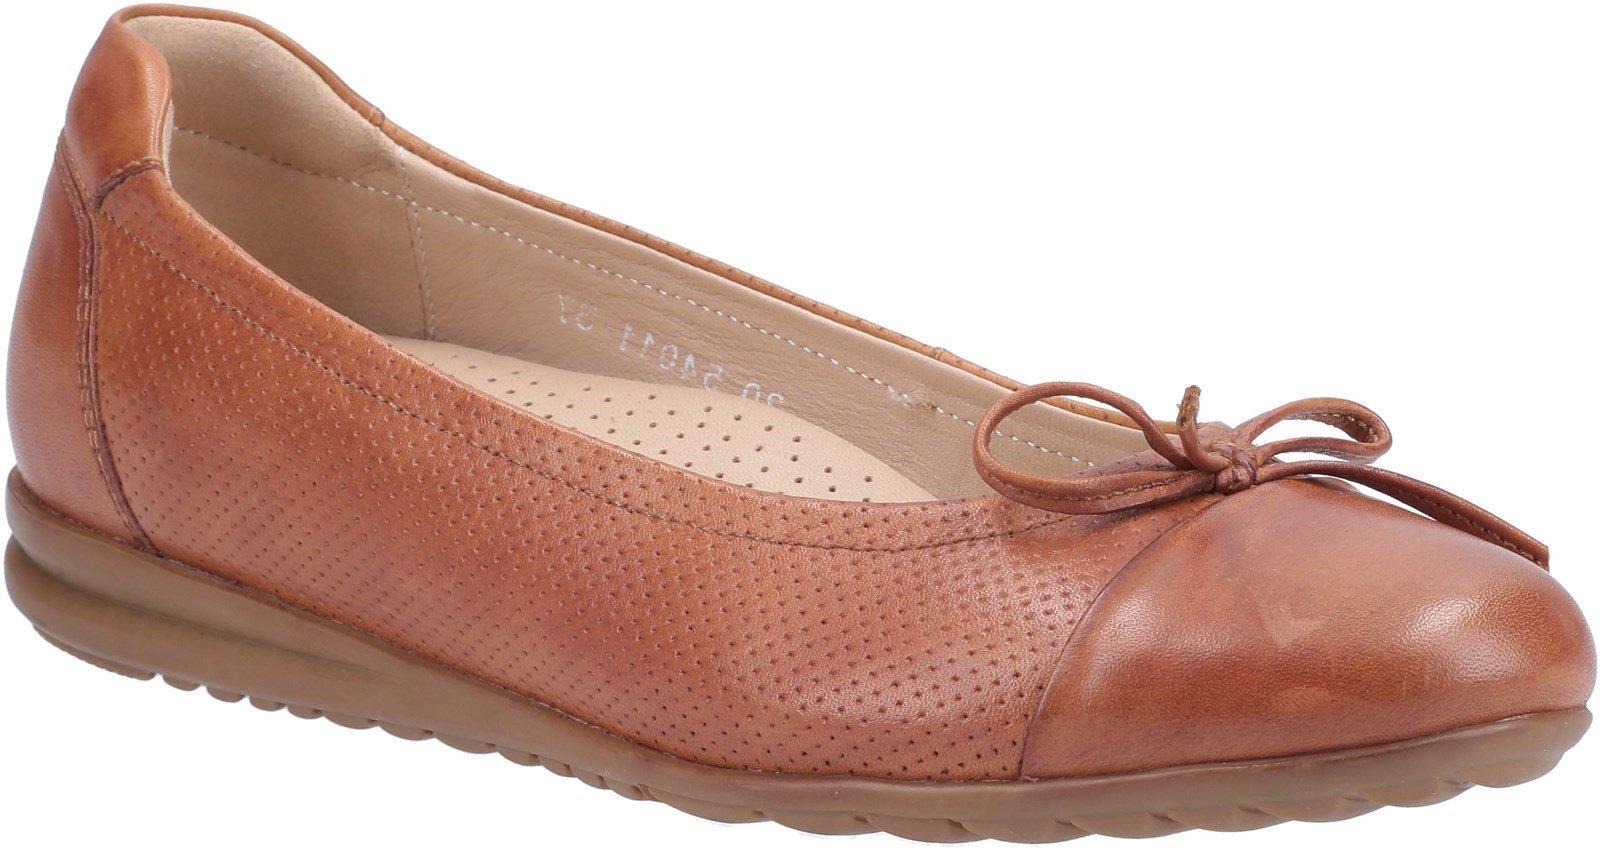 Hush Puppies Women's Jolene Slip On Shoes Various Colours 31189 - Tan 3